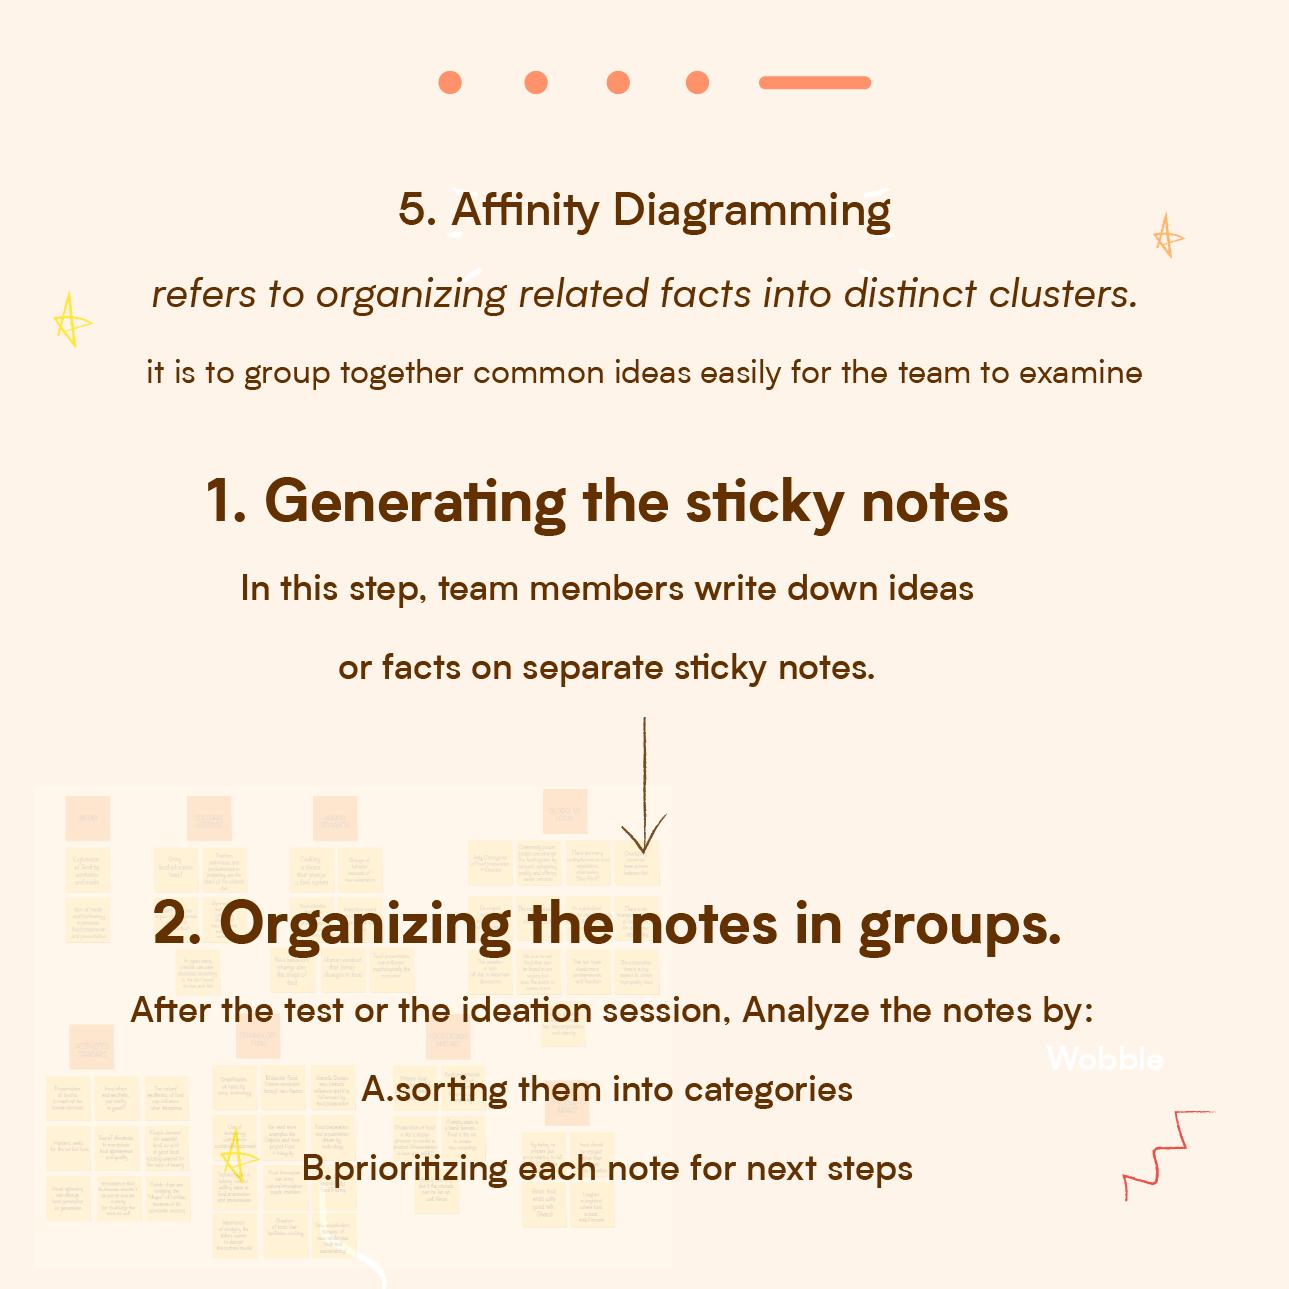 Ethnographic Affinity Diagramming